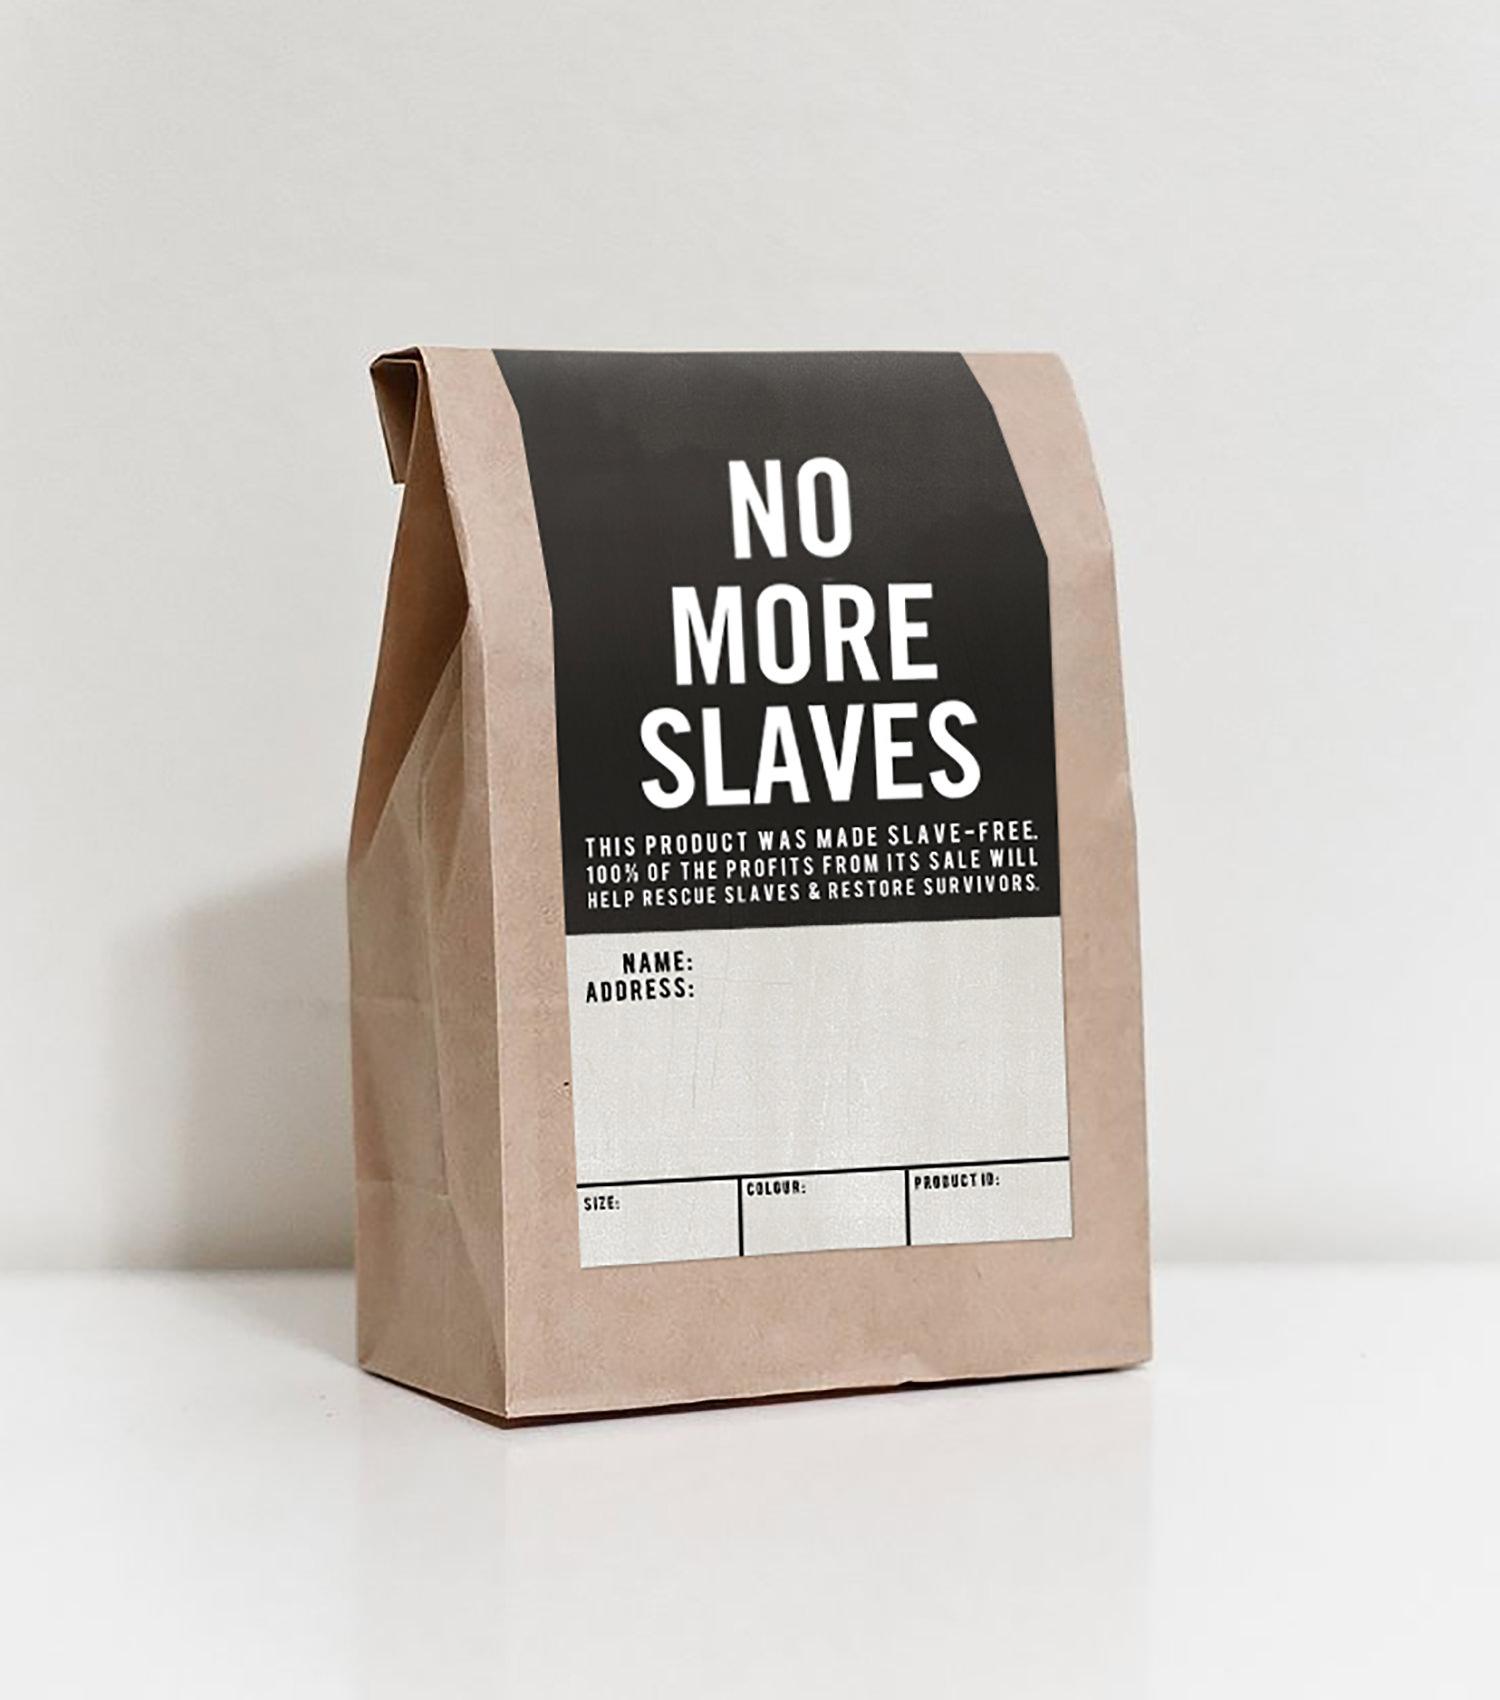 No-More-Slaves-Big-Blond-Bear-Branding-20.jpg